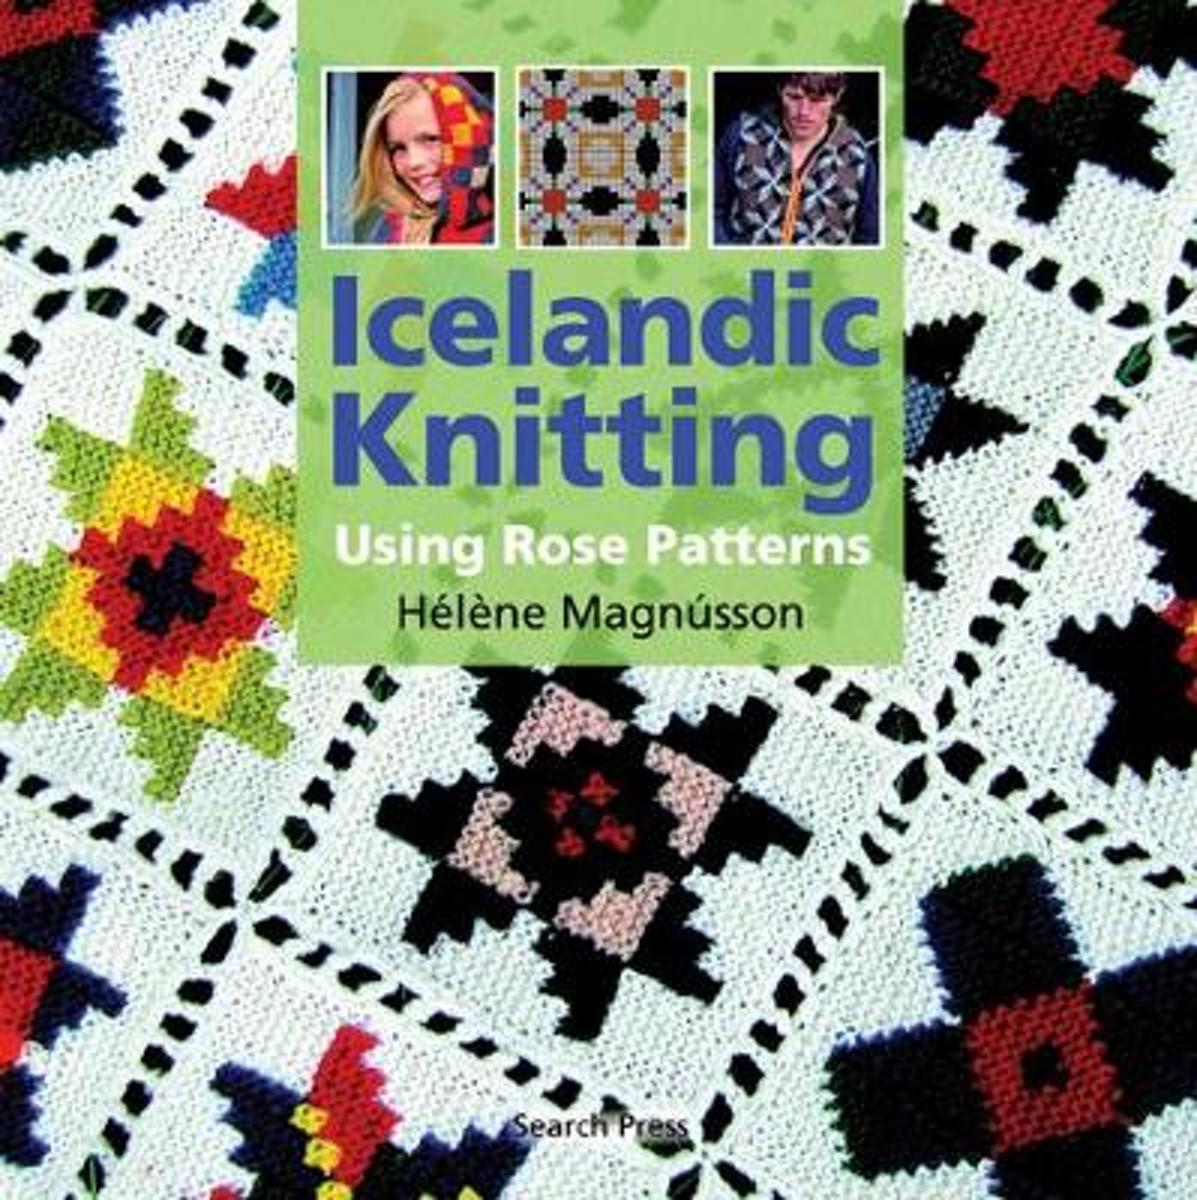 bol.com | Icelandic Knitting using Rose Patterns, Helene Magnusson ...